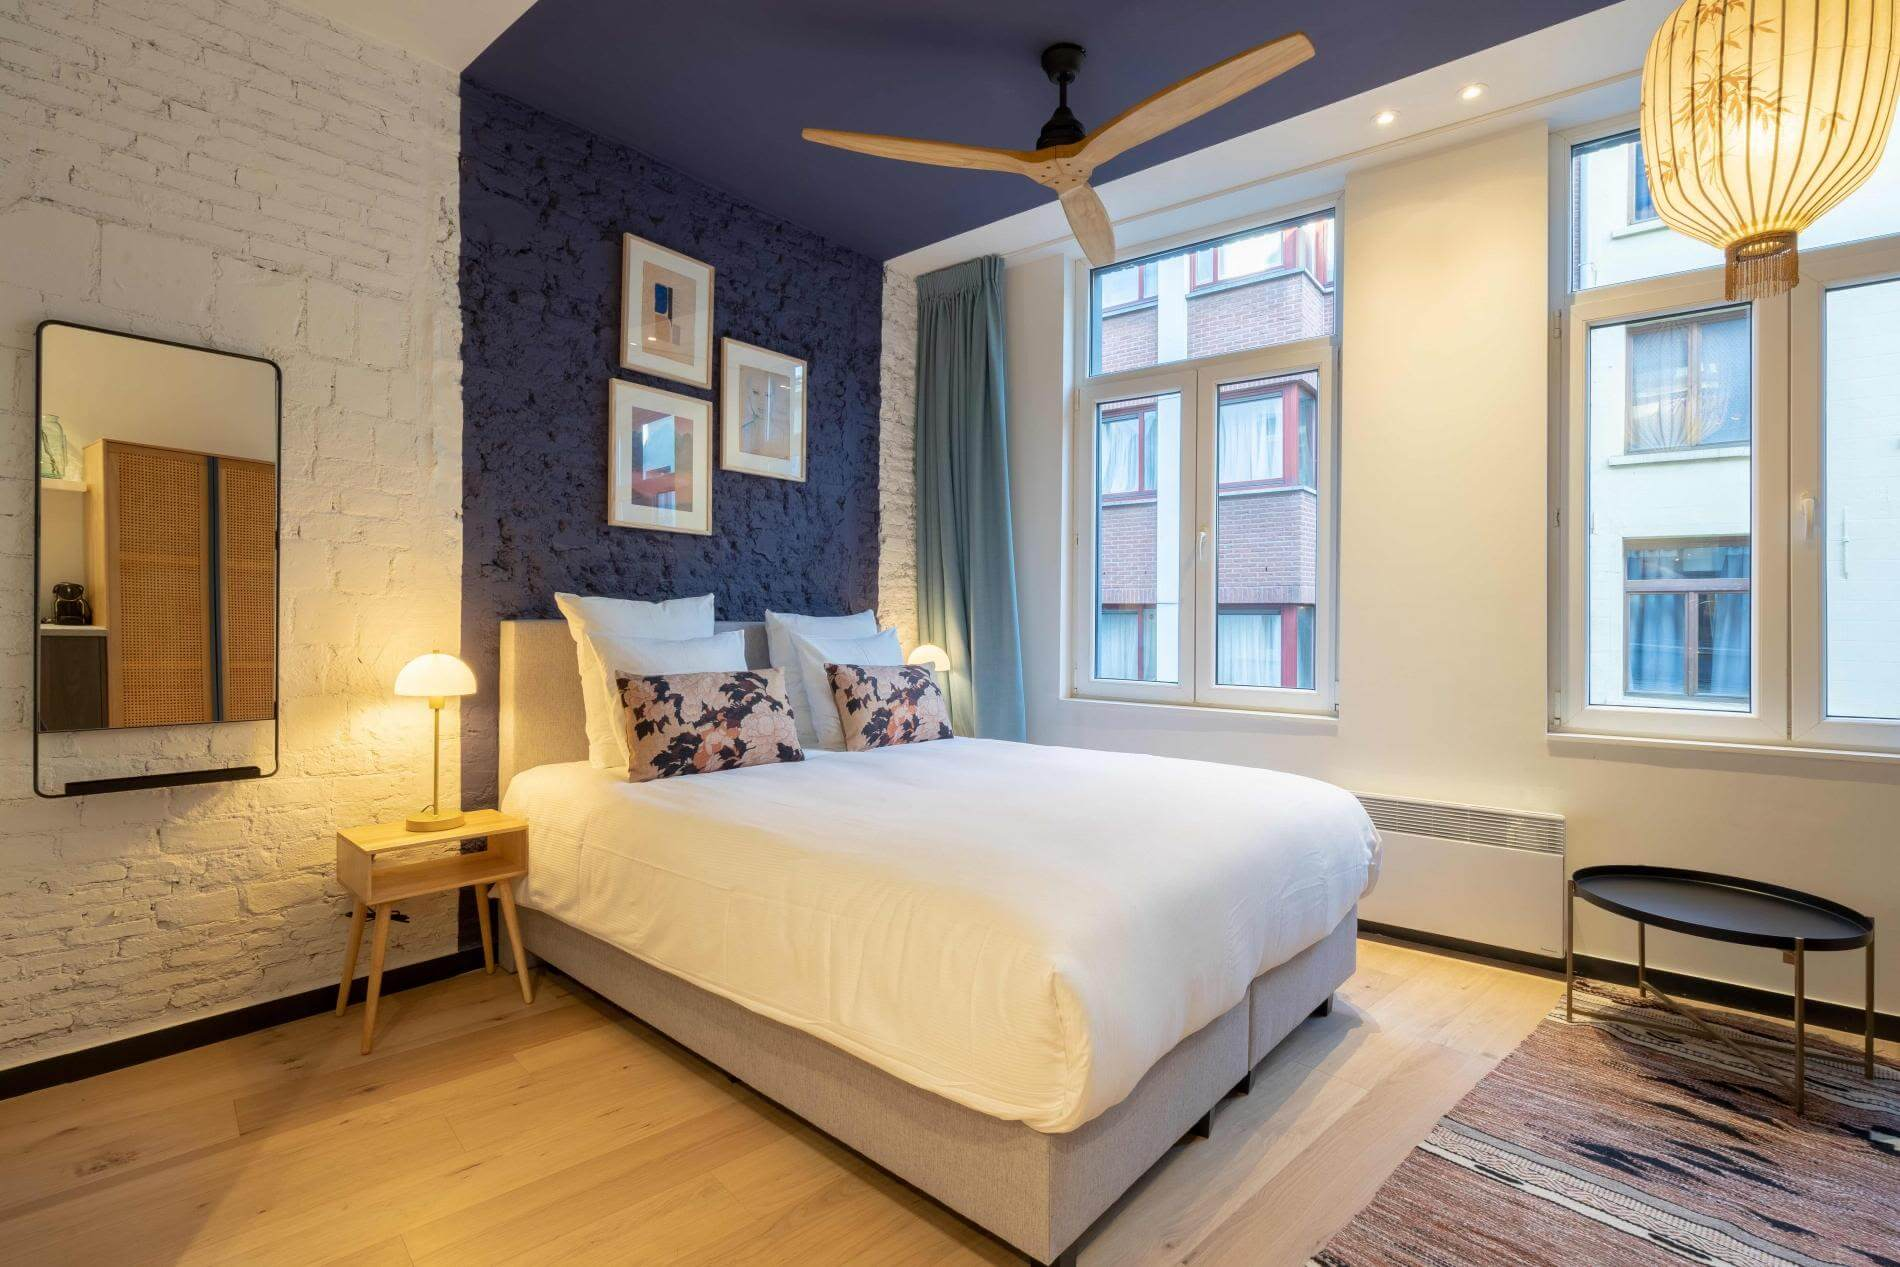 Studio accommodation in Antwerp for rent